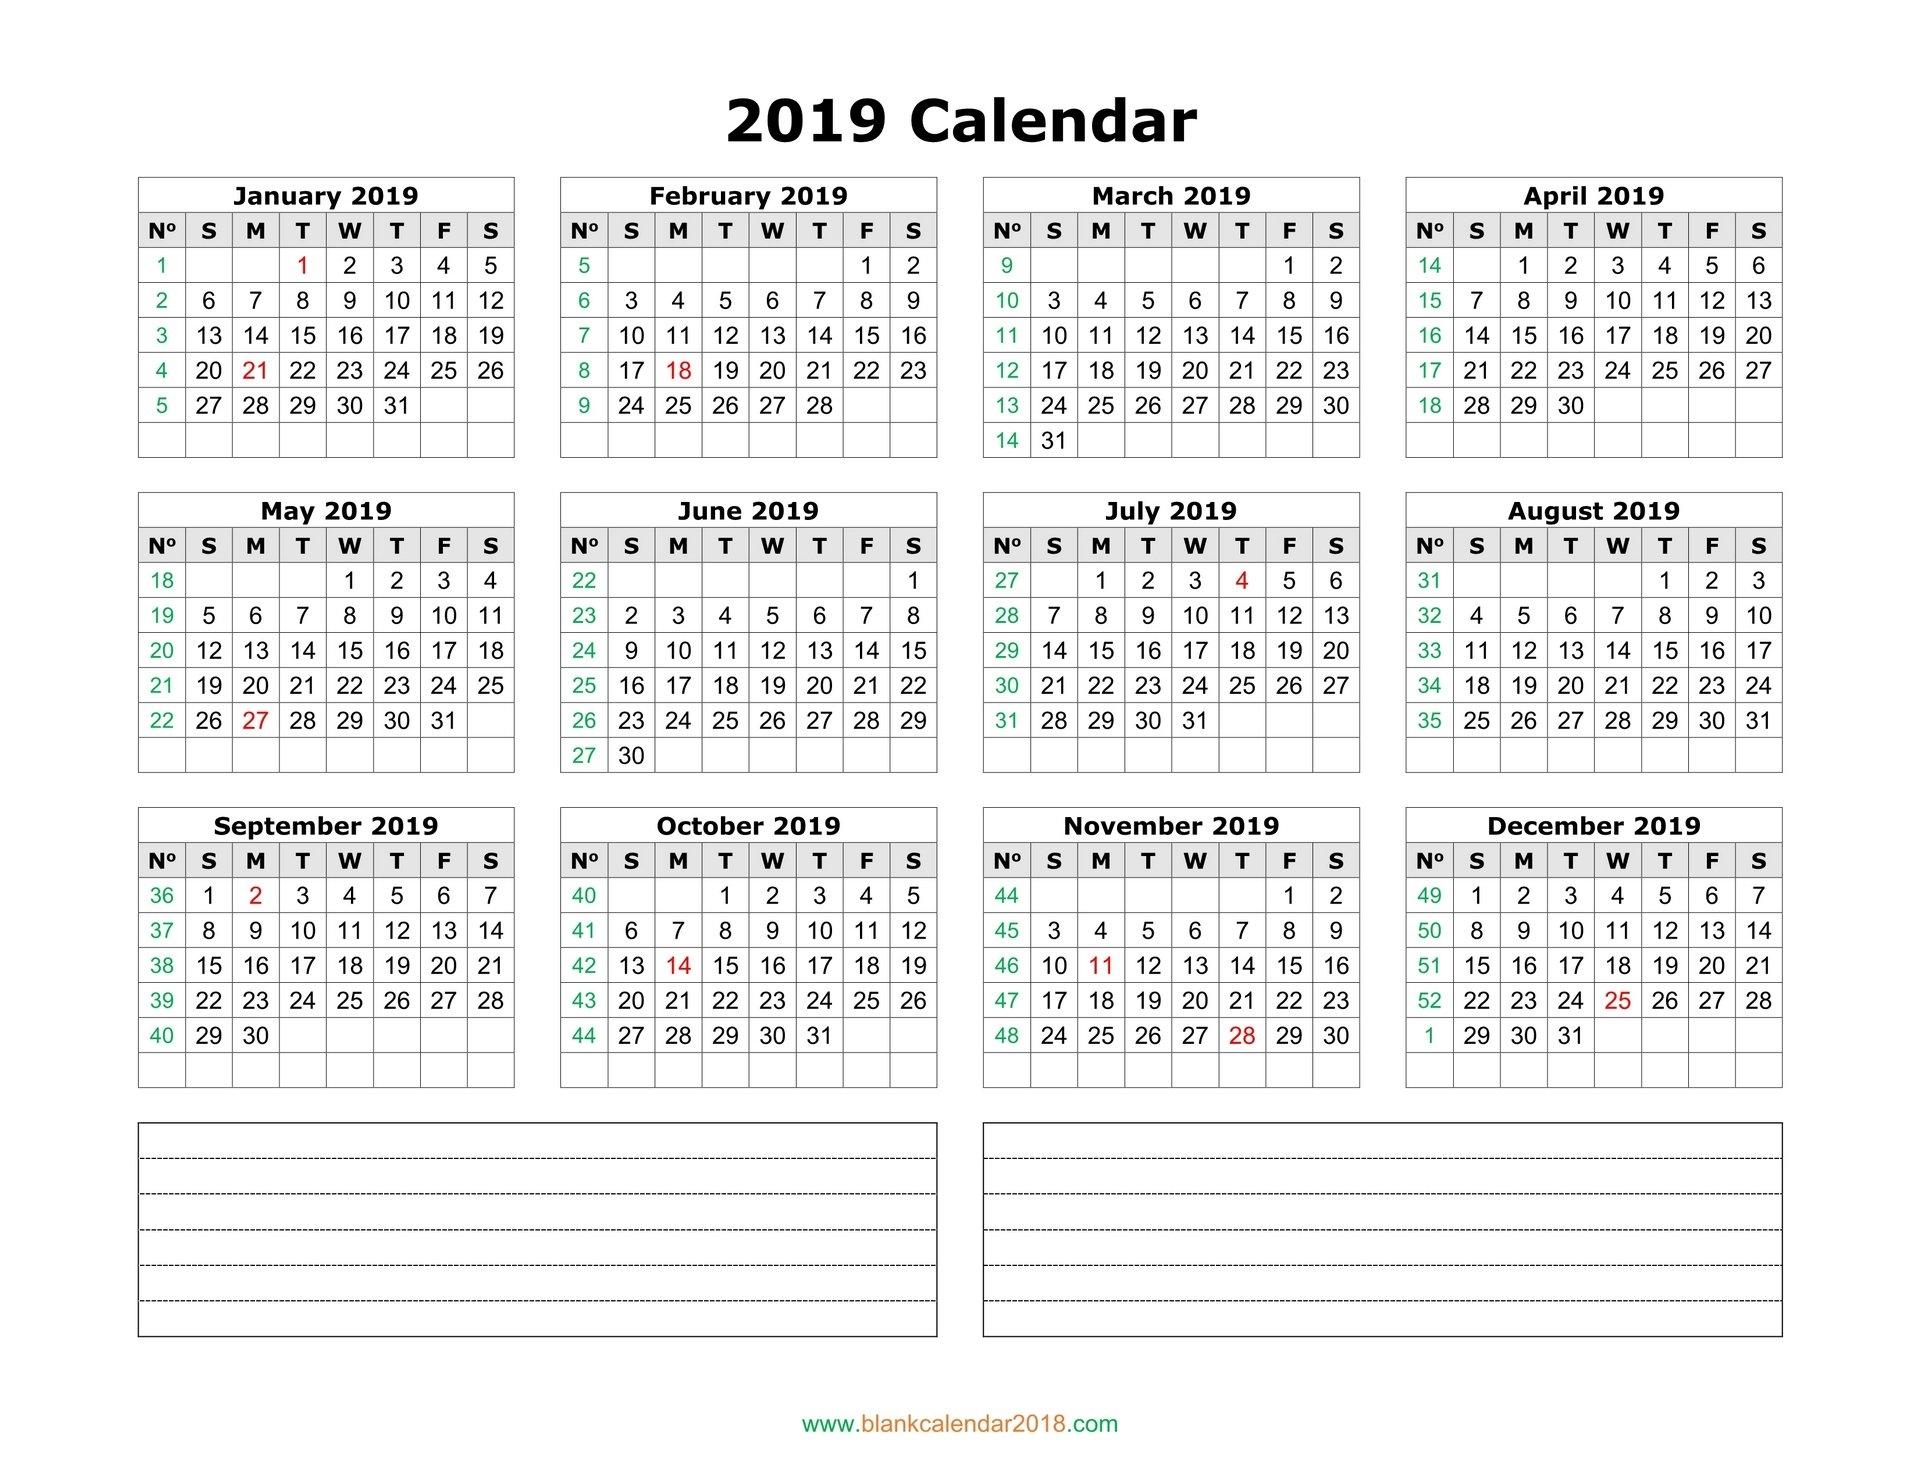 Blank Calendar 2019 Calendar 2019 Annual